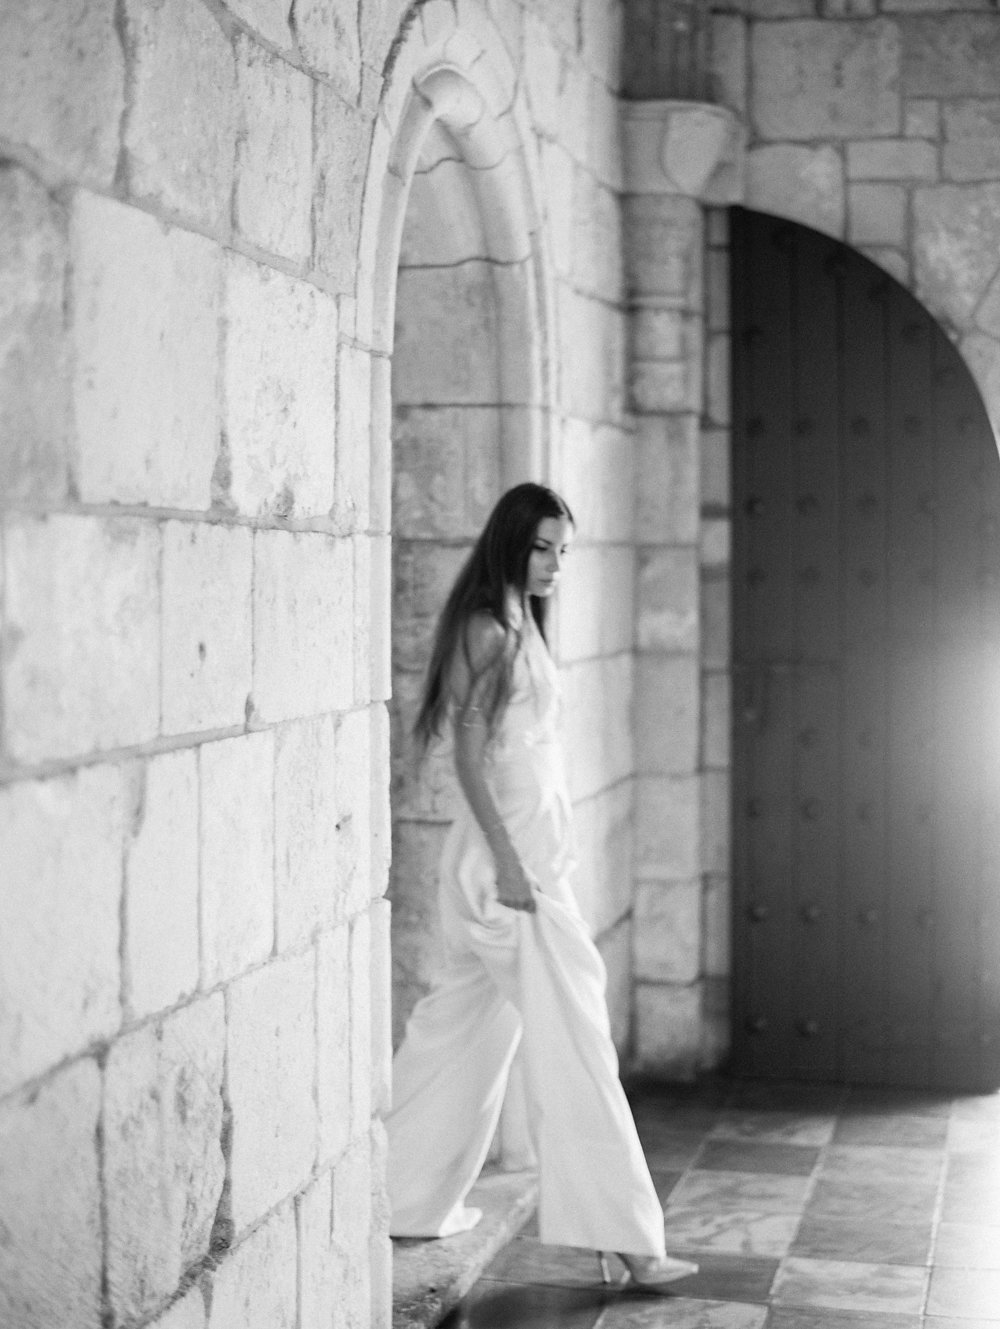 LaurenKinsey_SpainWedding_LisbonWedding_MiamiWedding011.JPG